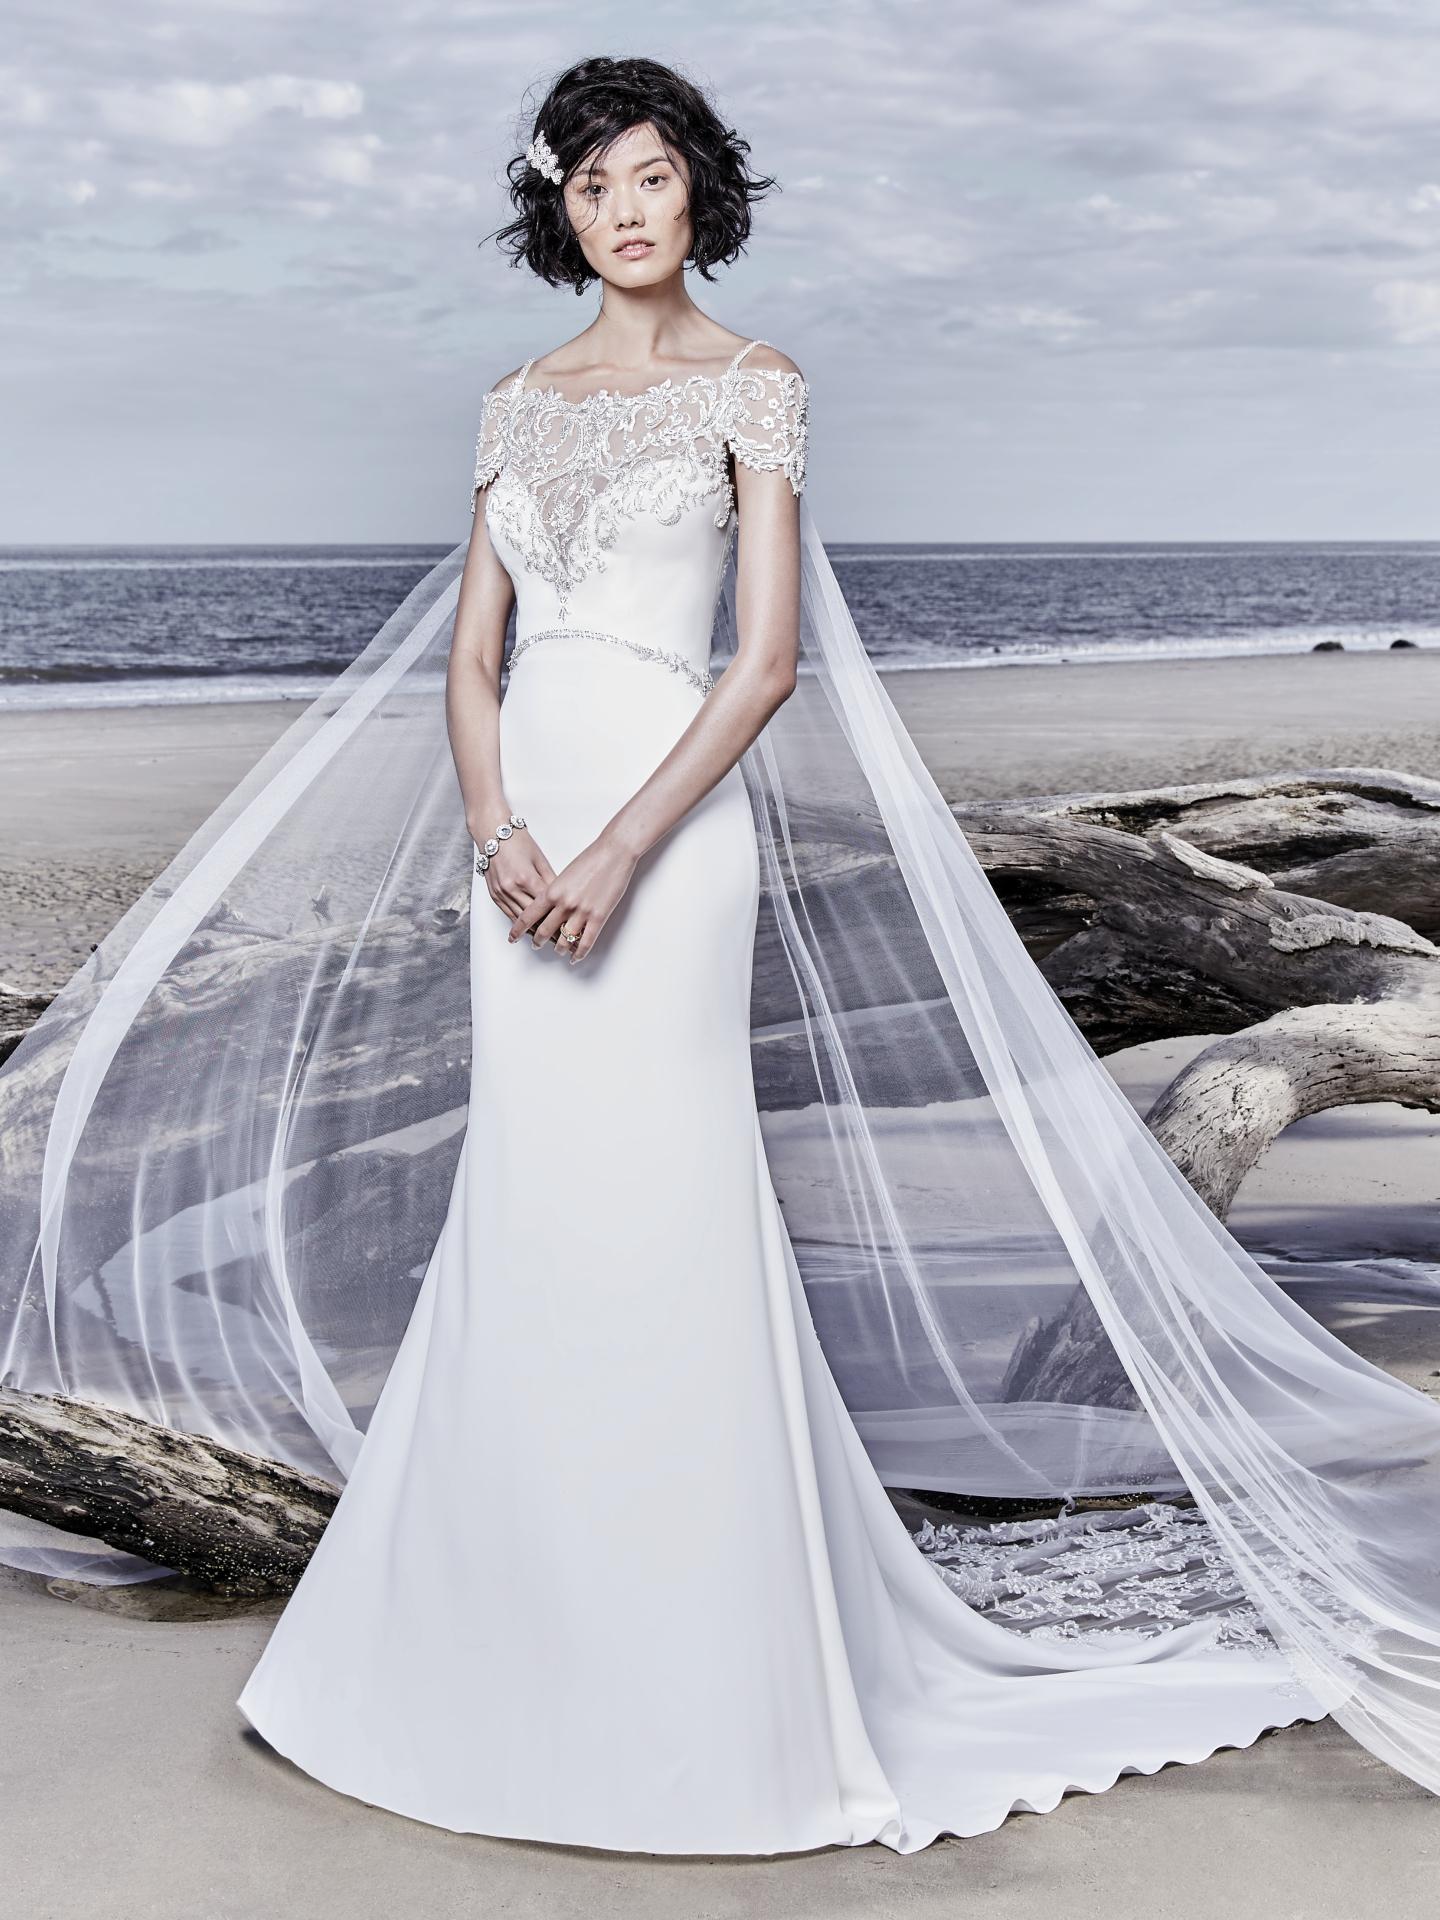 Flattering Wedding Dresses for Curvy Brides - Hayward by Sottero & Midgley